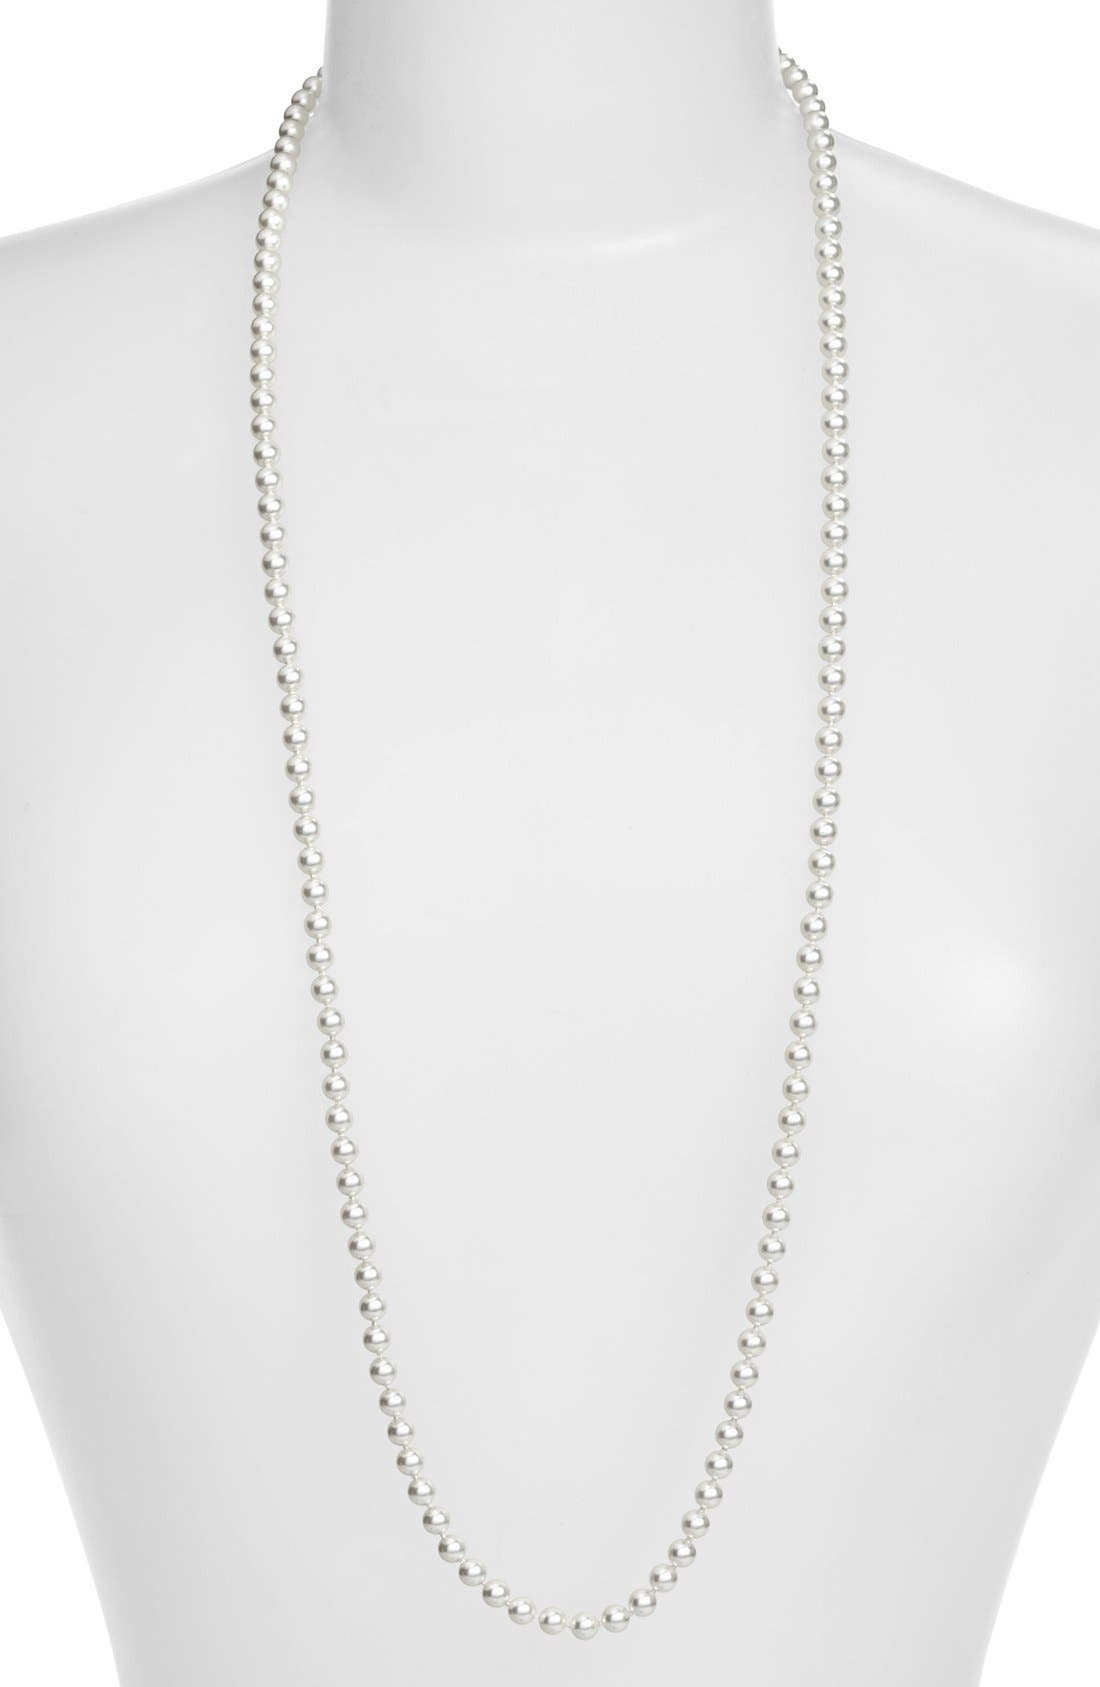 Alternate Image 1 Selected - NadriImitation Pearl Long Necklace